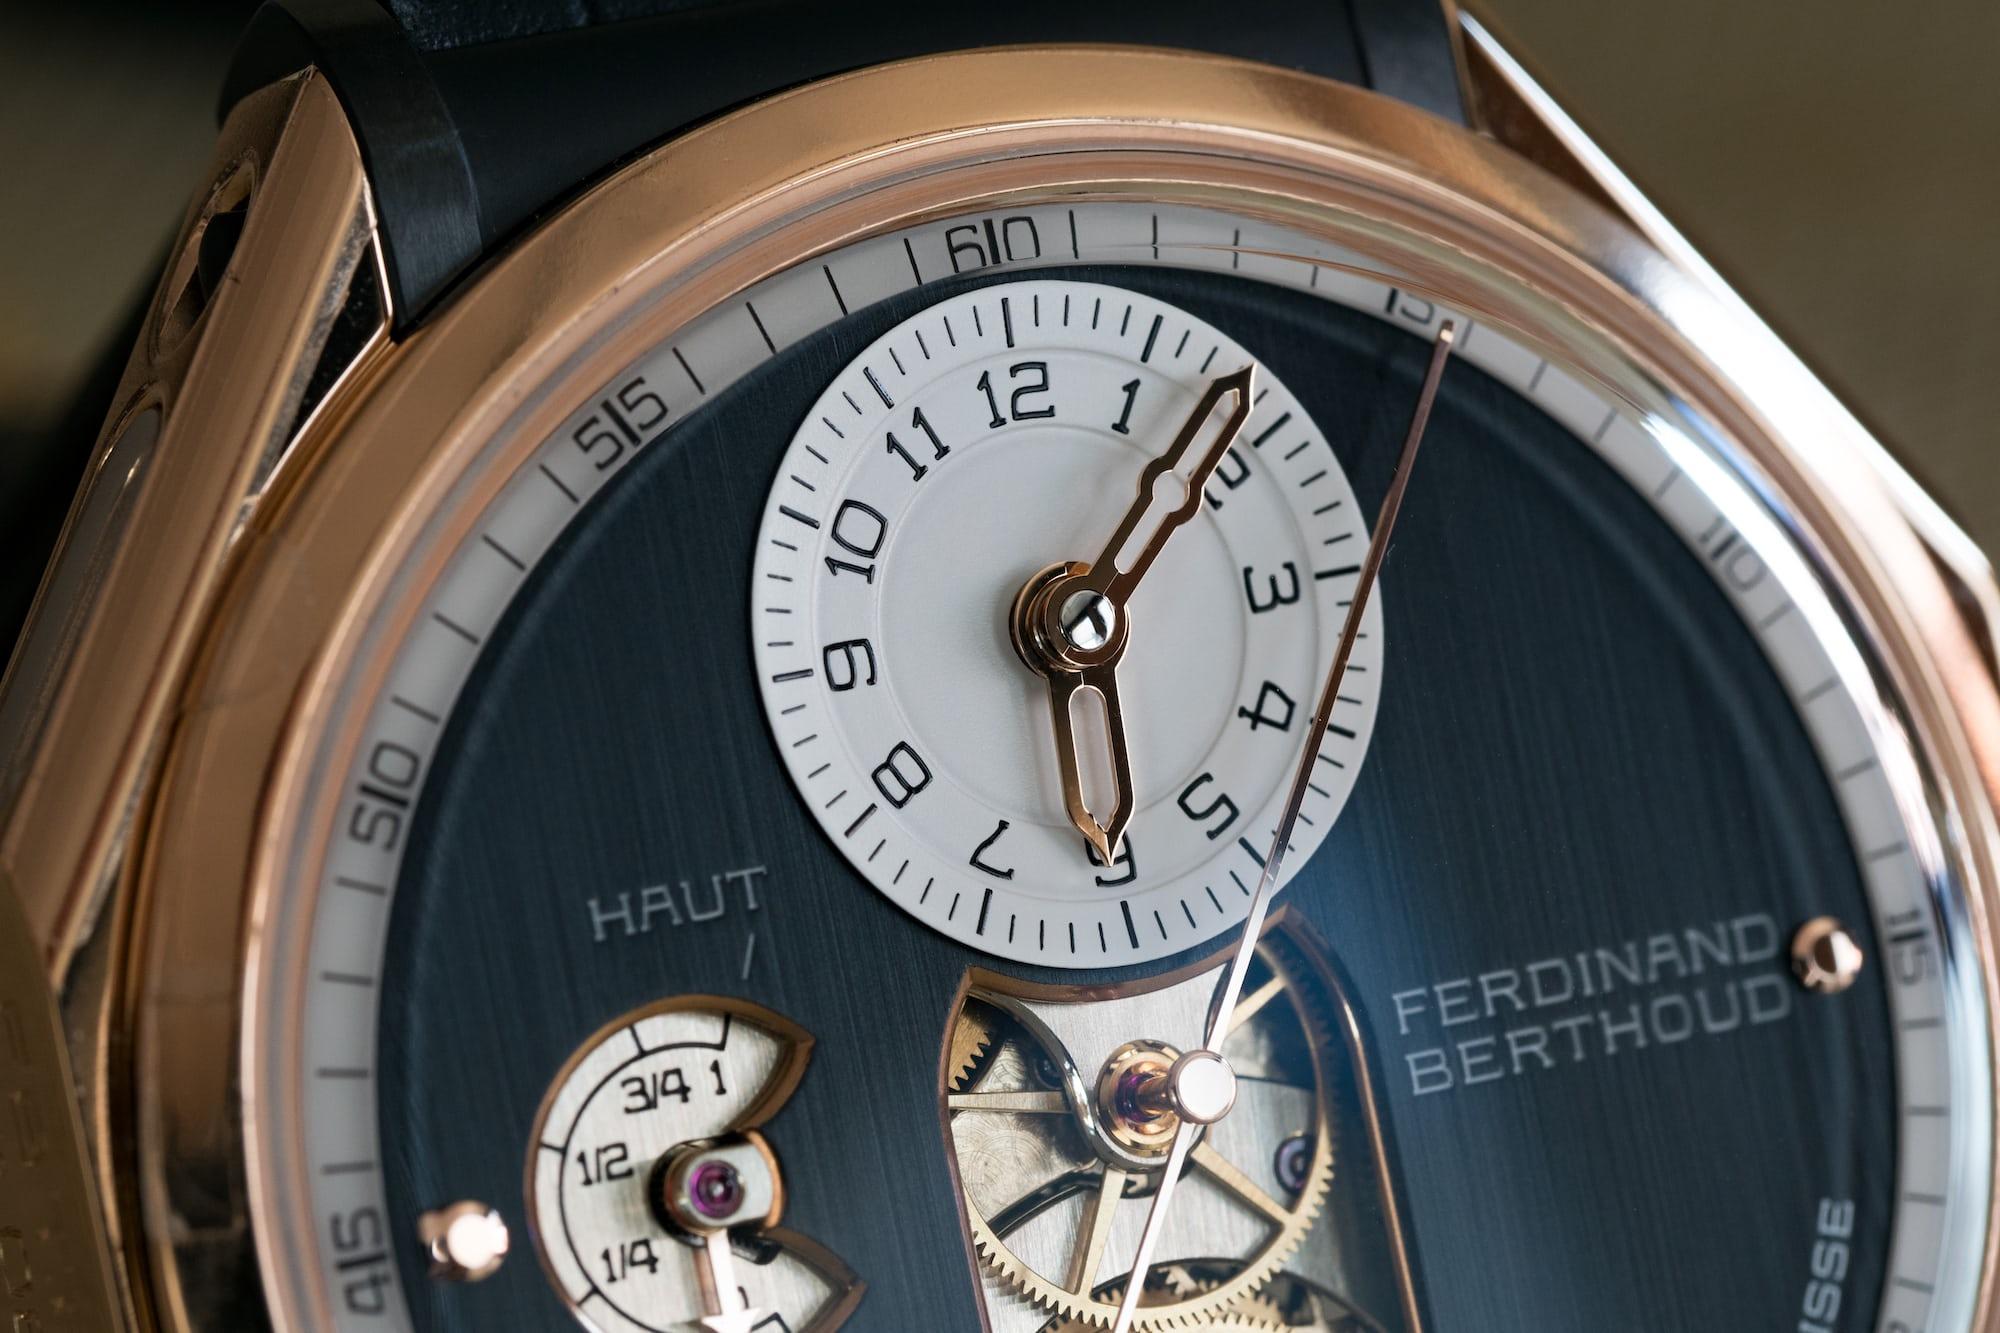 Ferdinand Berthoud Chronomtre FB 1 dial closeup A Week On The Wrist: The Ferdinand Berthoud Chronomtre FB 1 A Week On The Wrist: The Ferdinand Berthoud Chronomtre FB 1 P6120259